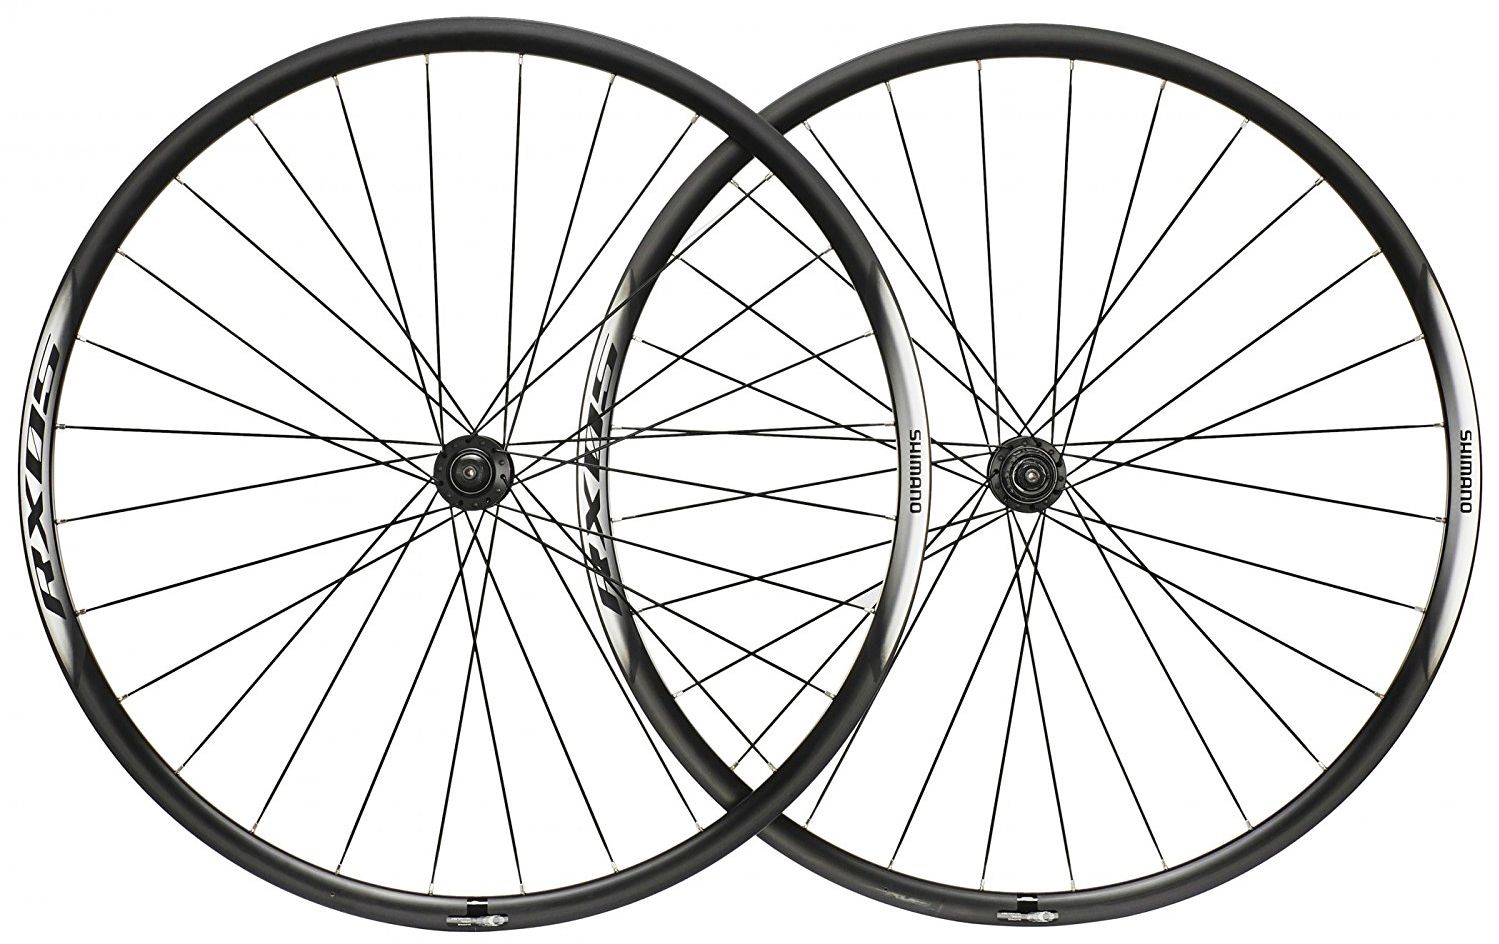 Запчасть Shimano RX05 (EWHRX05PDACBS),  колеса в сборе  - артикул:286122